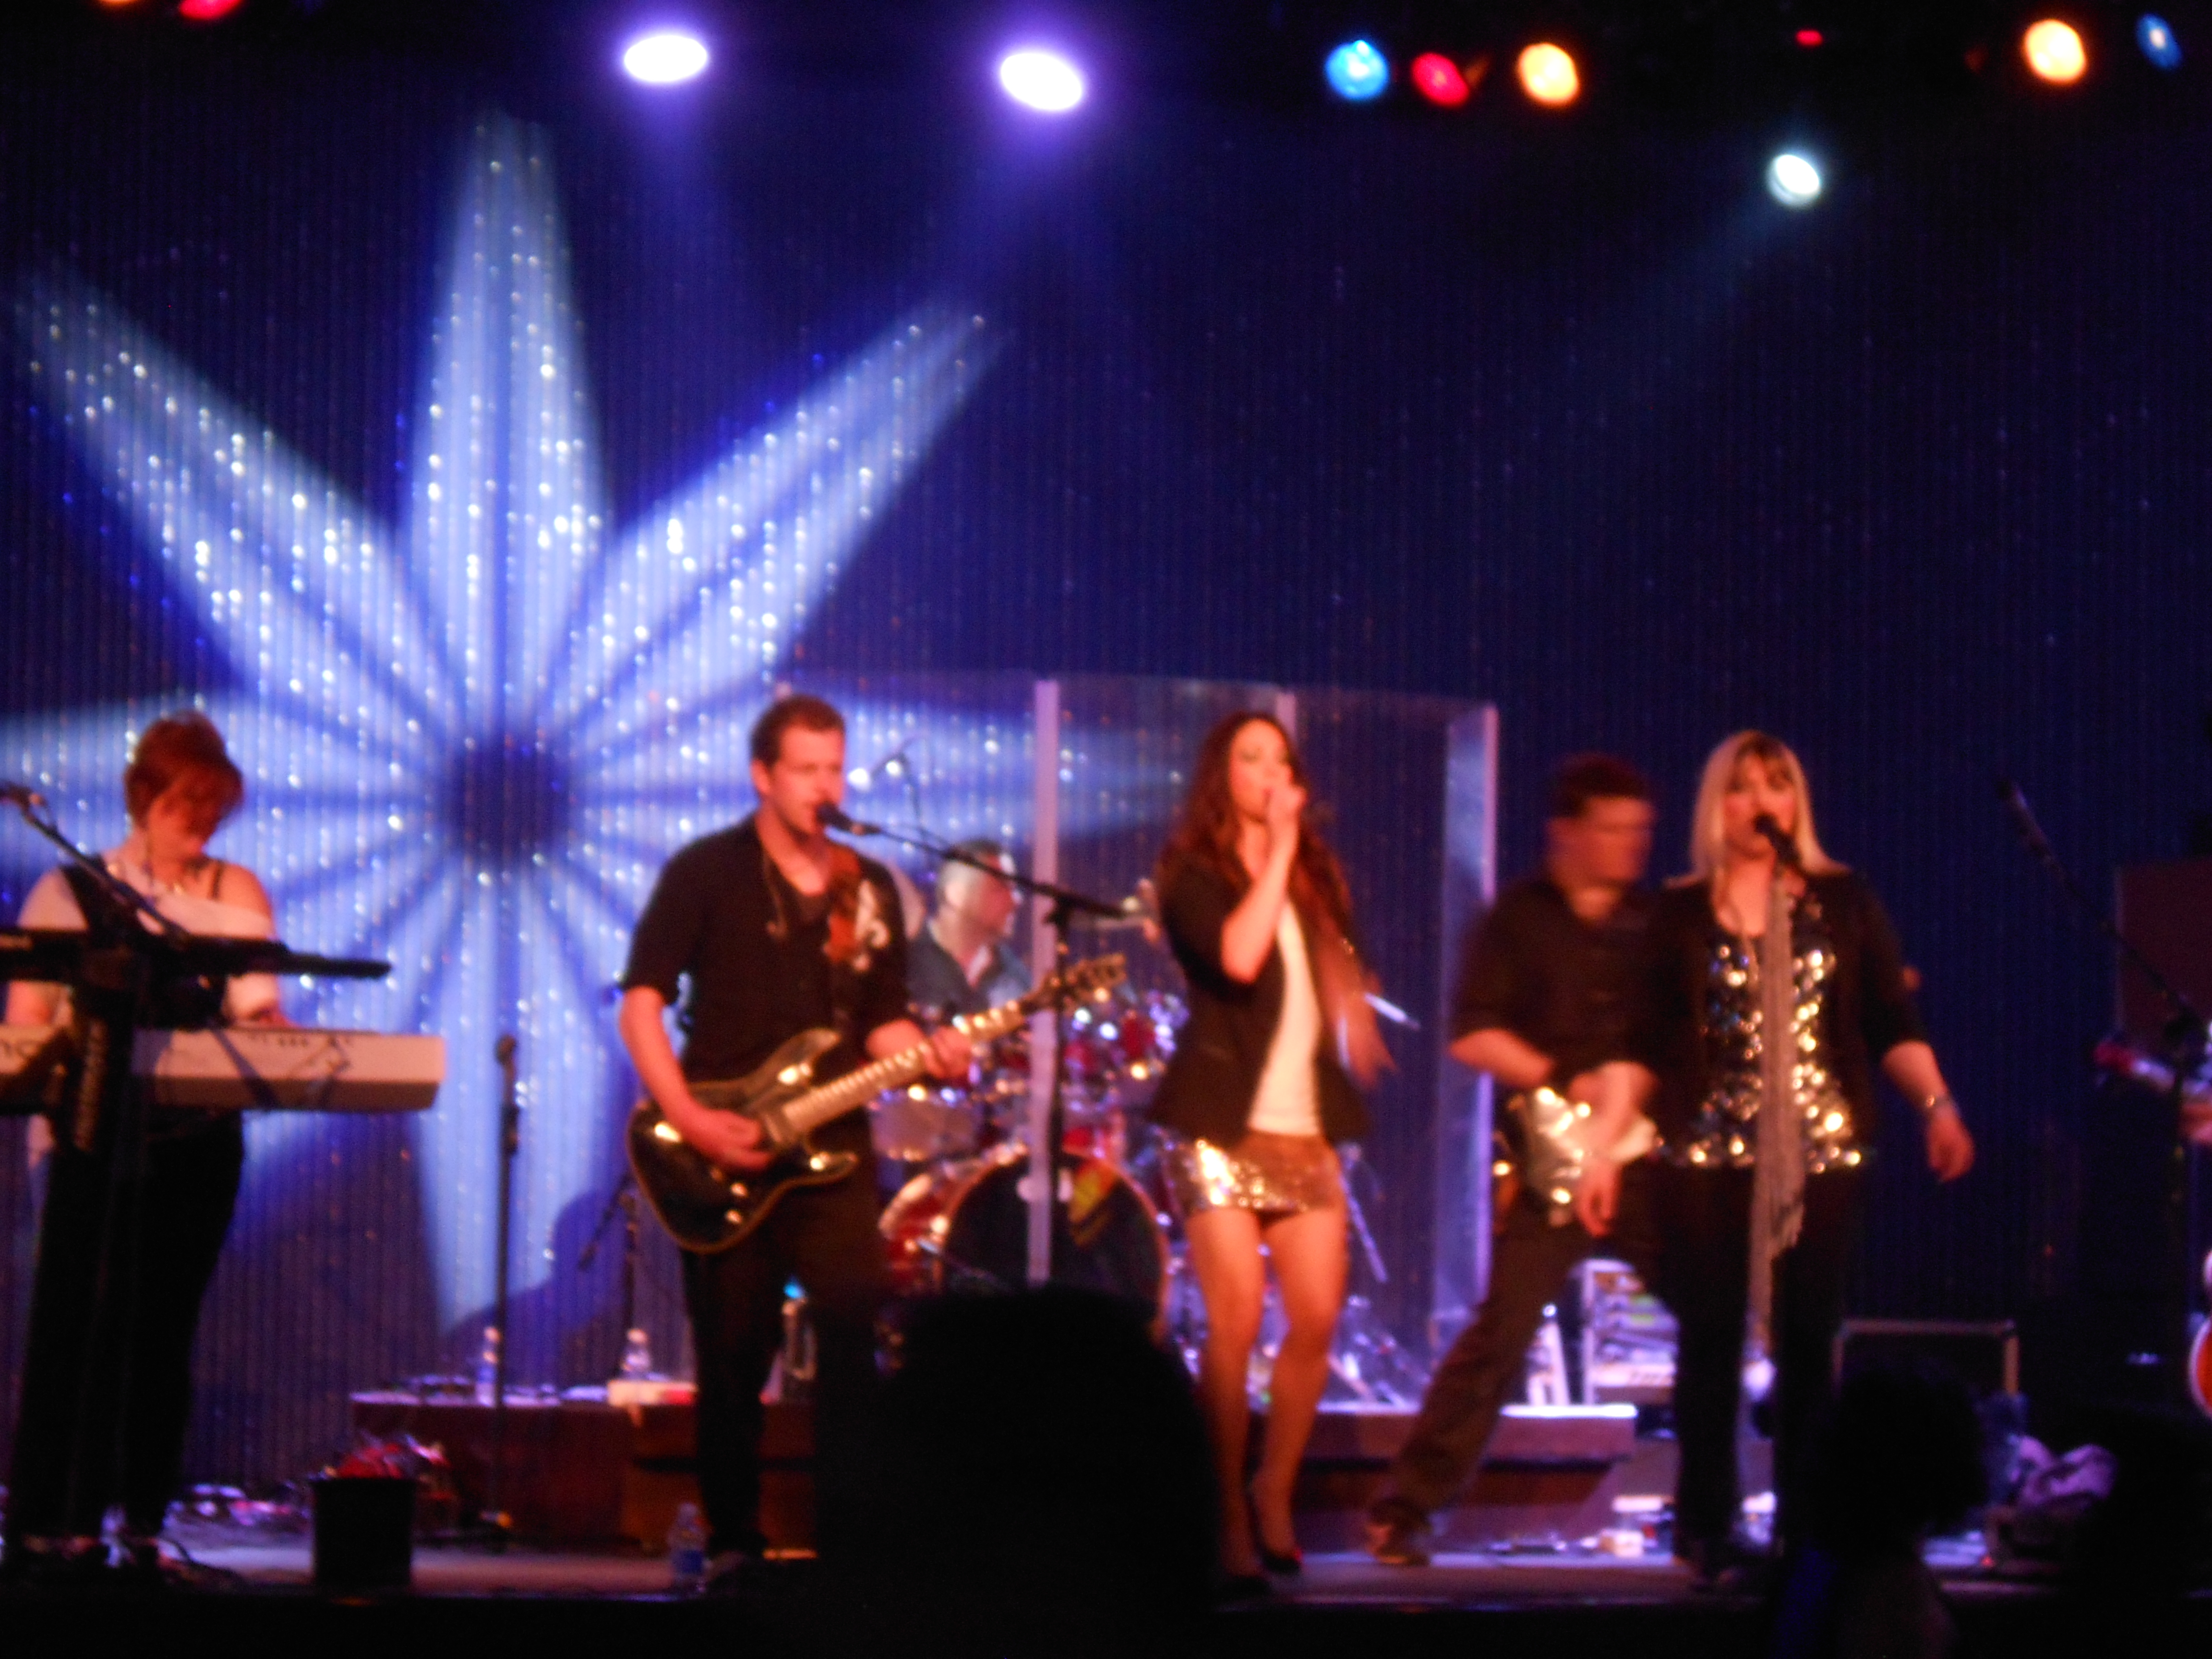 River spirit casino bands